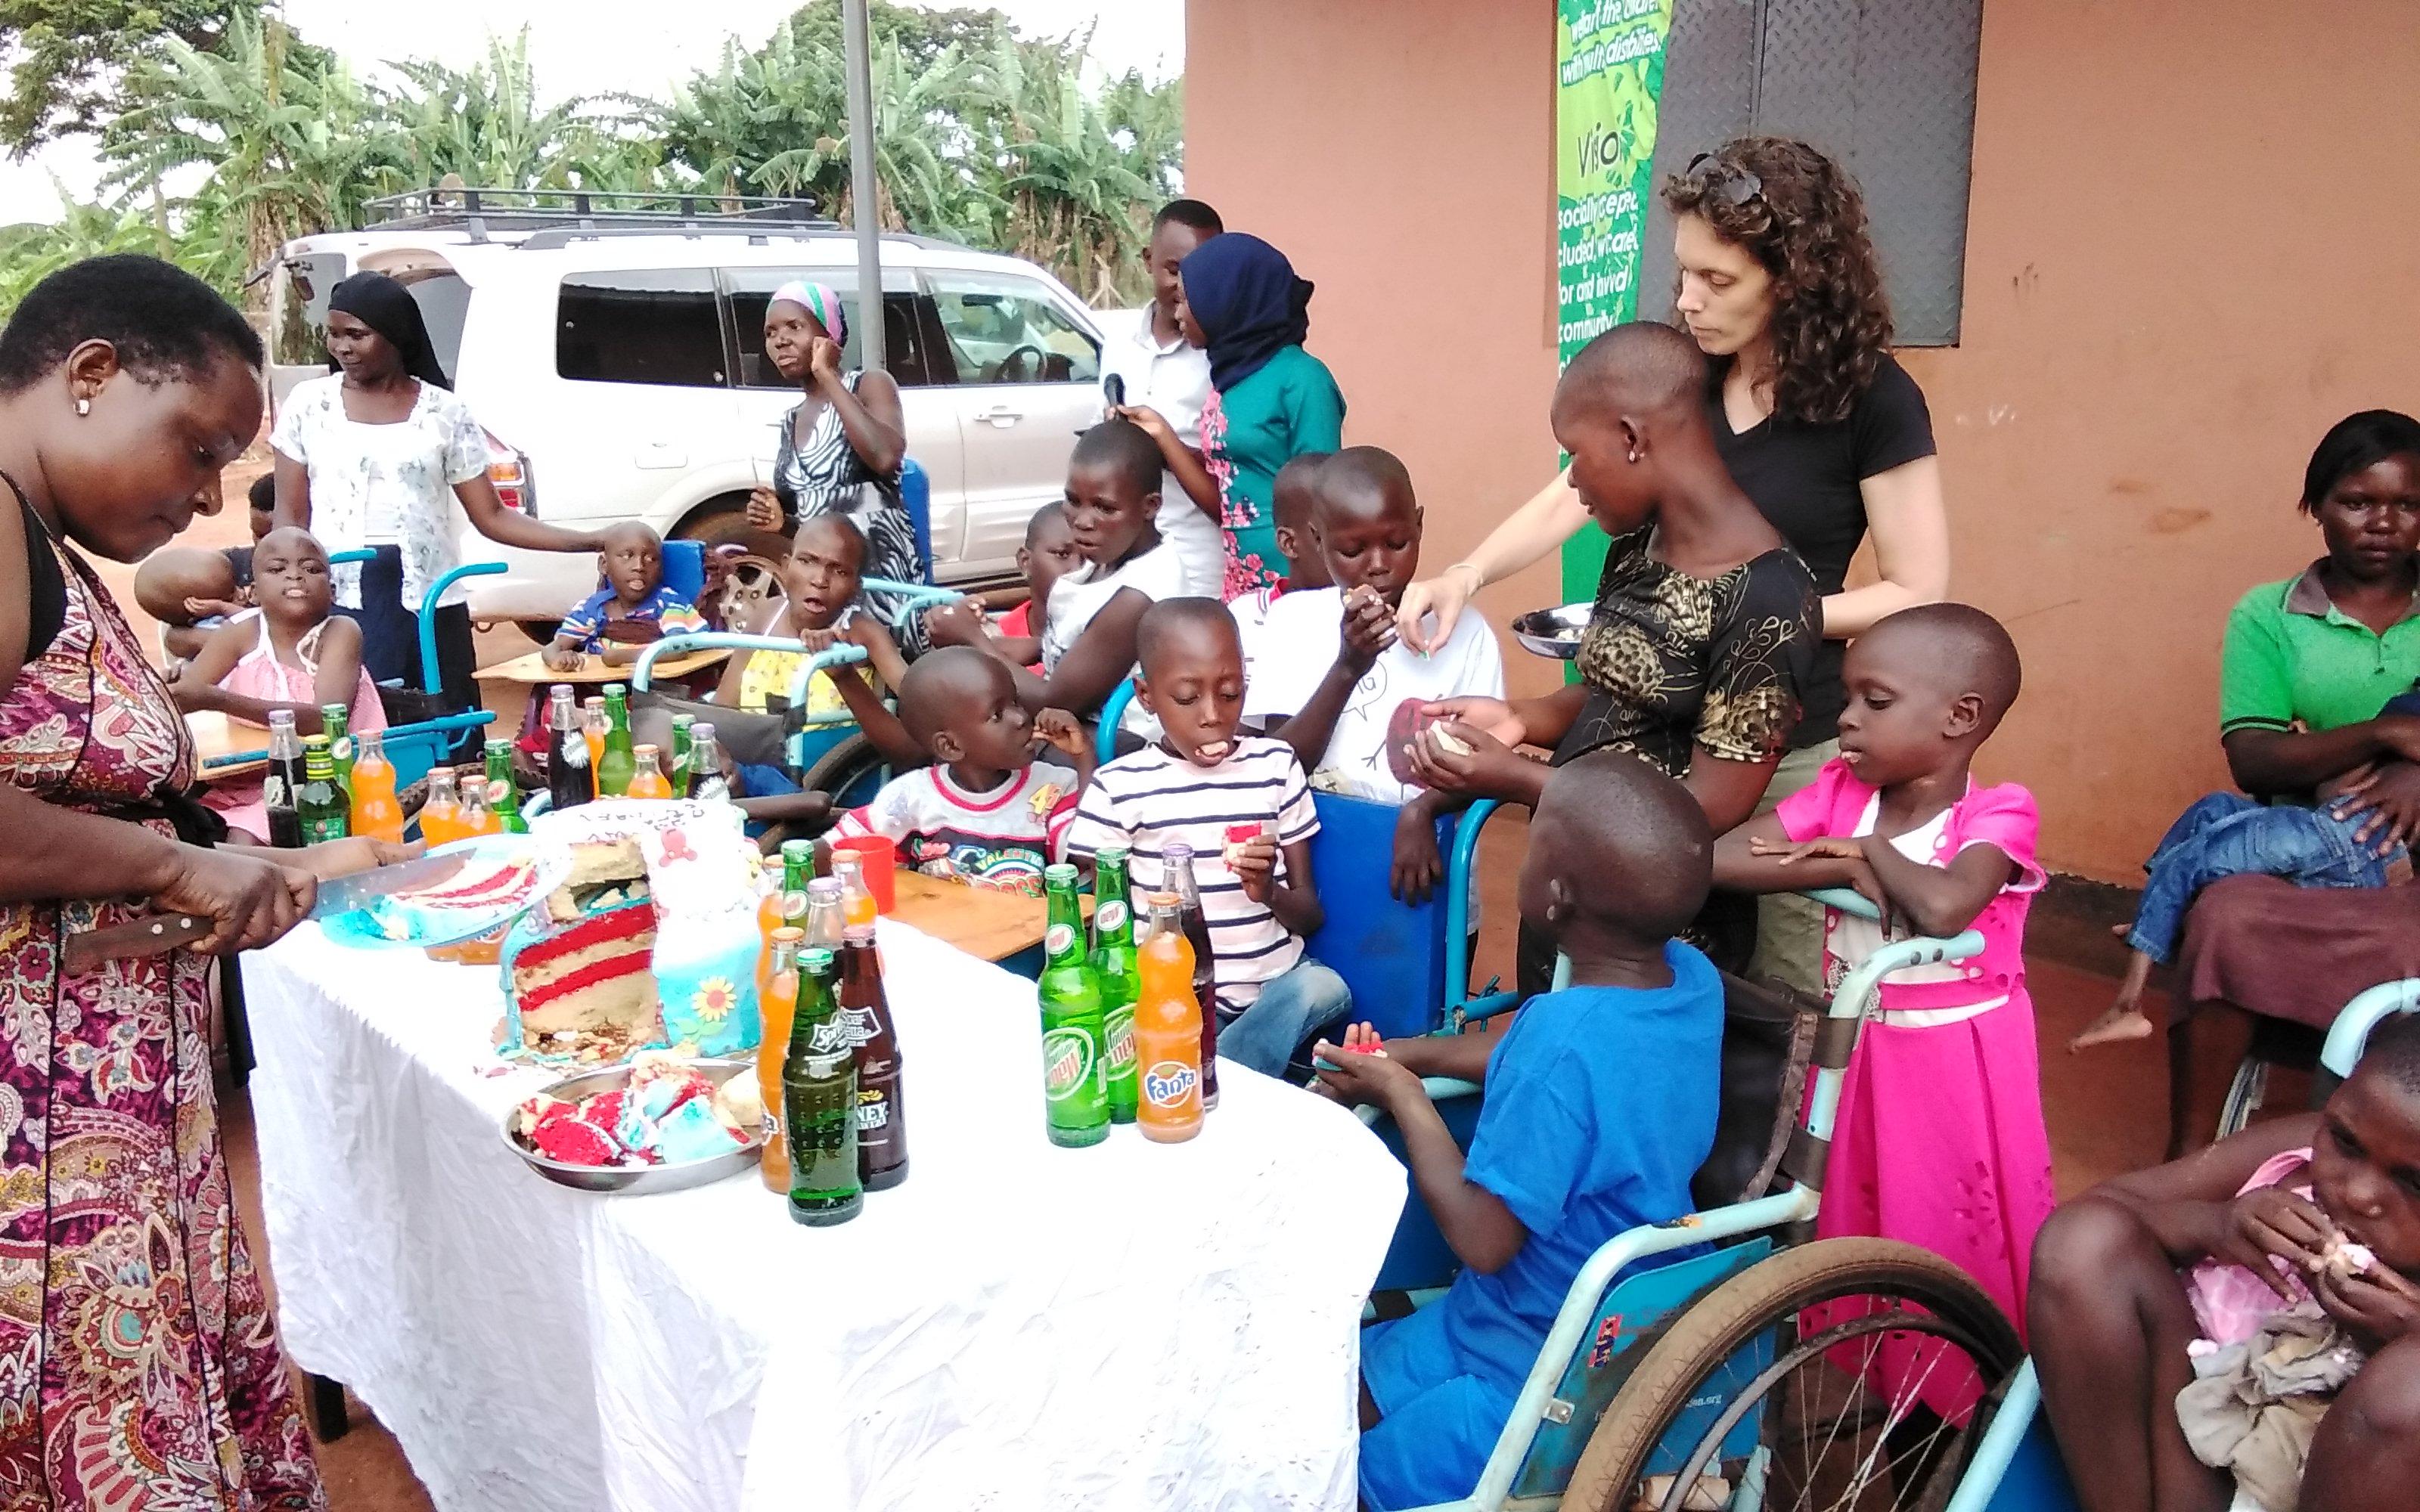 Children's birthday party held outdoors